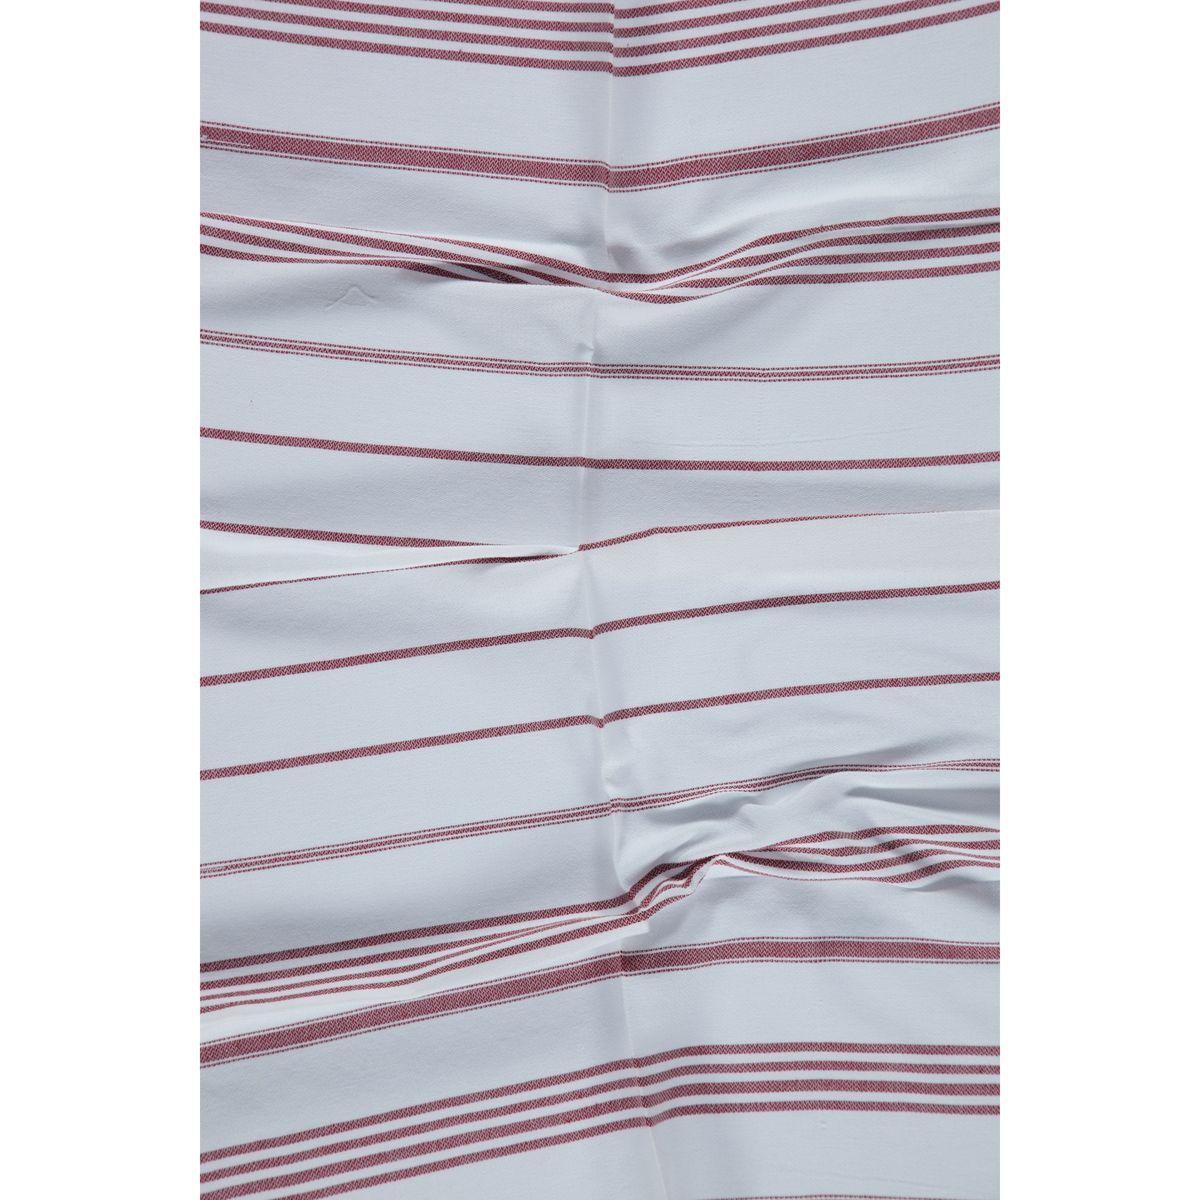 Peshkir Leyla / Bordeaux Stripes